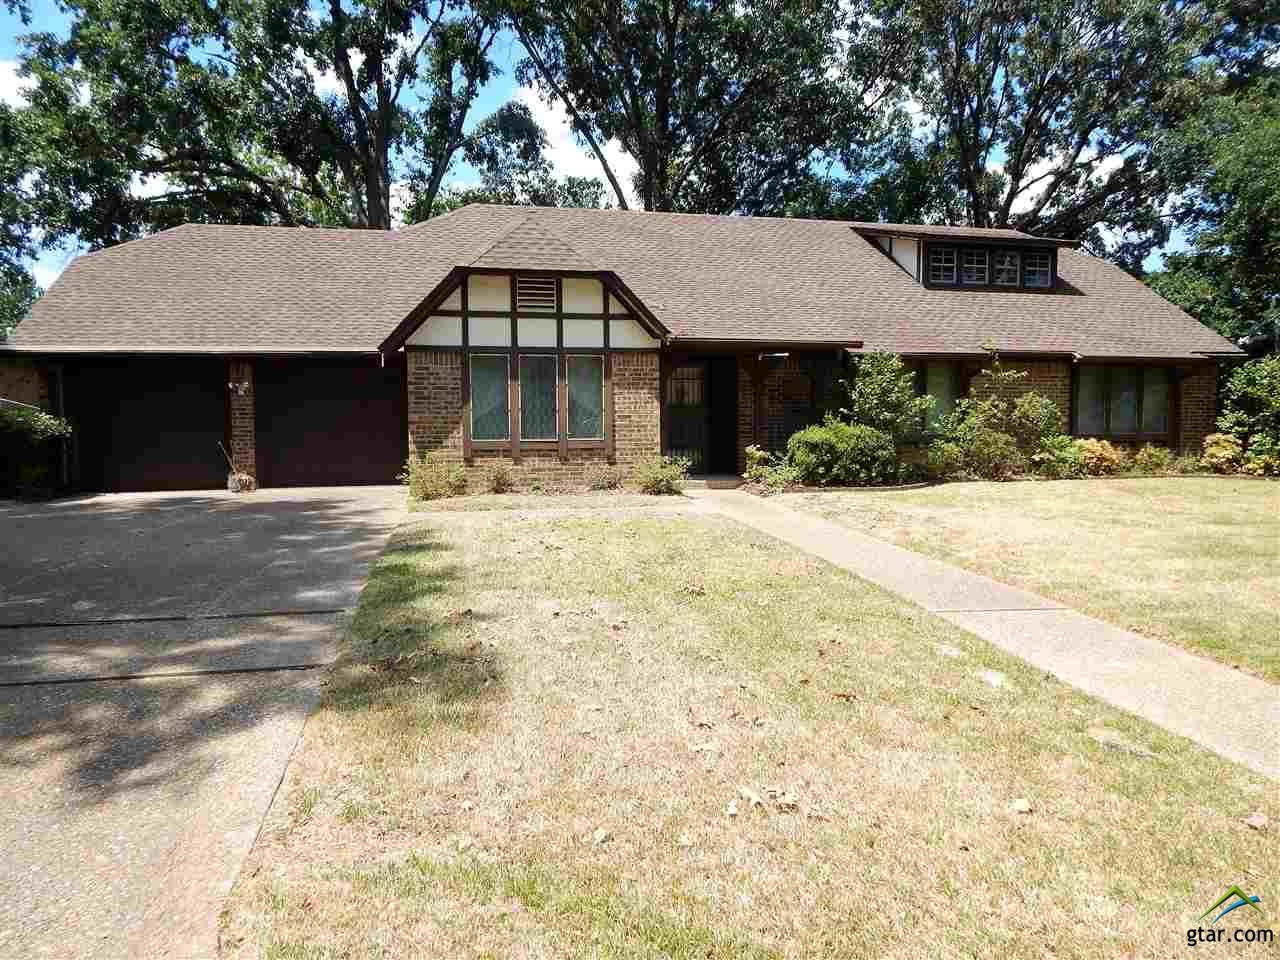 609 Spring Creek Dr, Tyler, TX 75703 - MLS 10112184 - Coldwell Banker